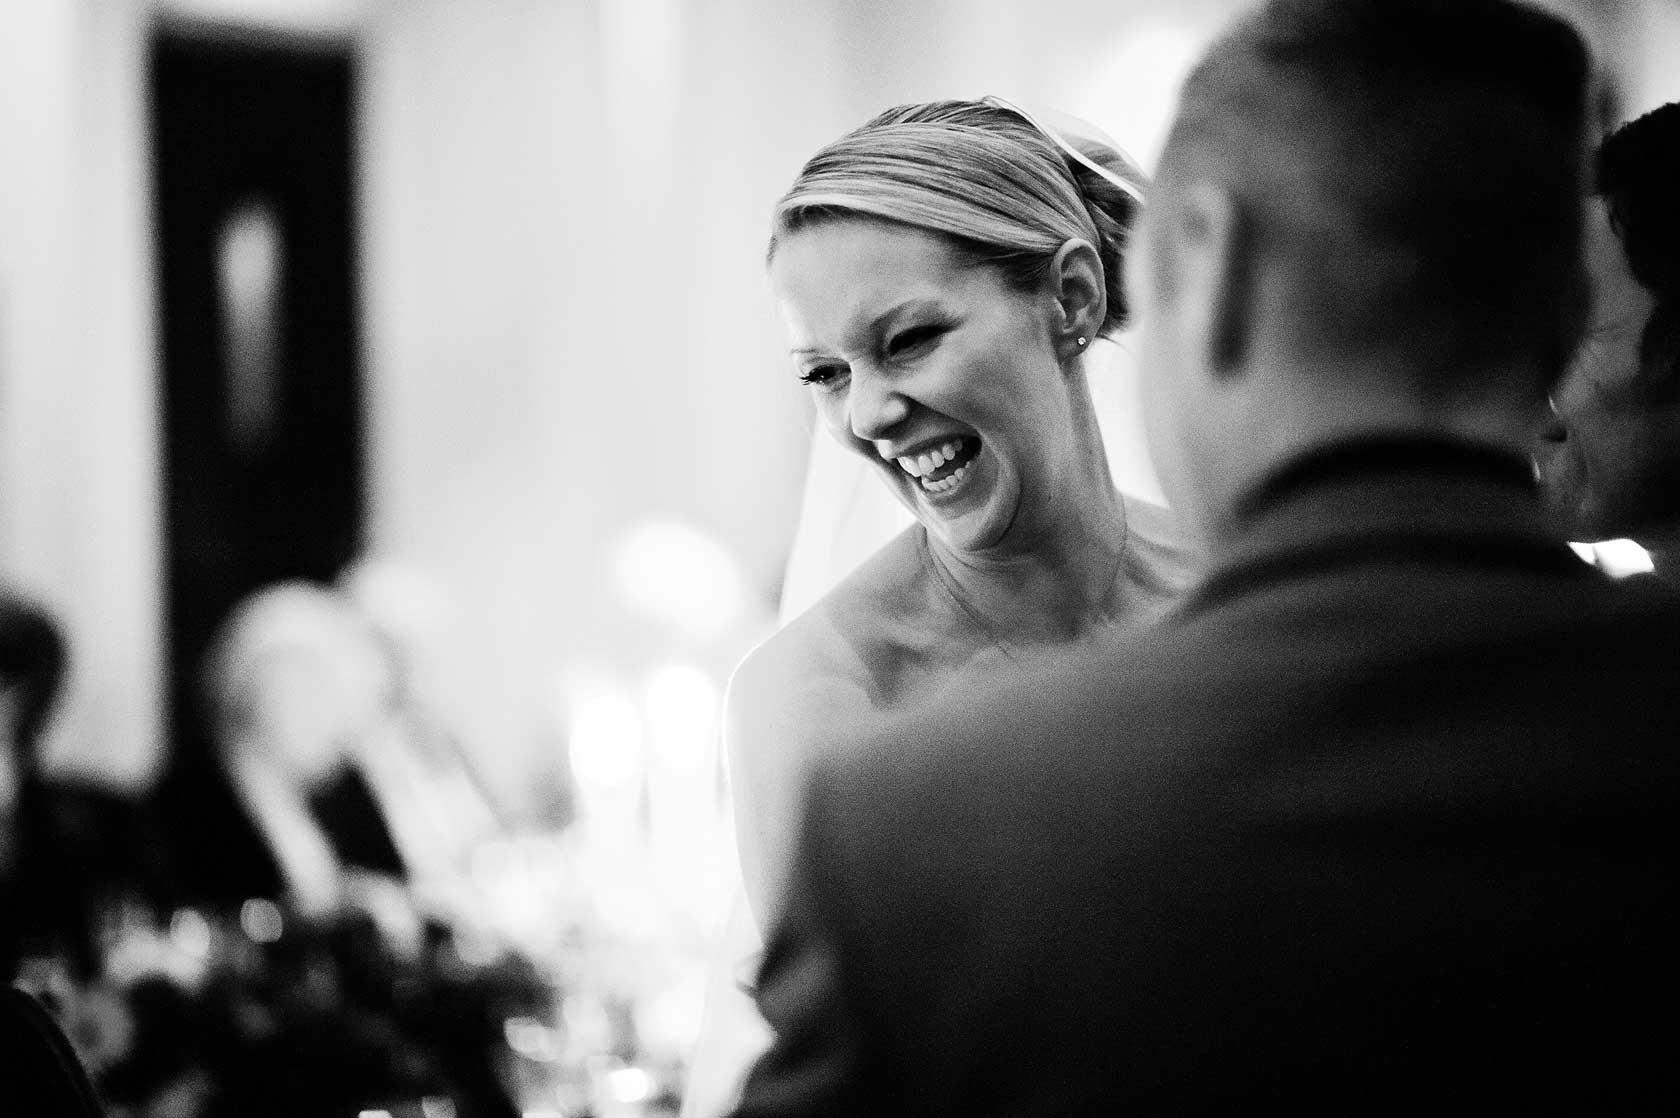 Reportage Wedding Photography at Christmas